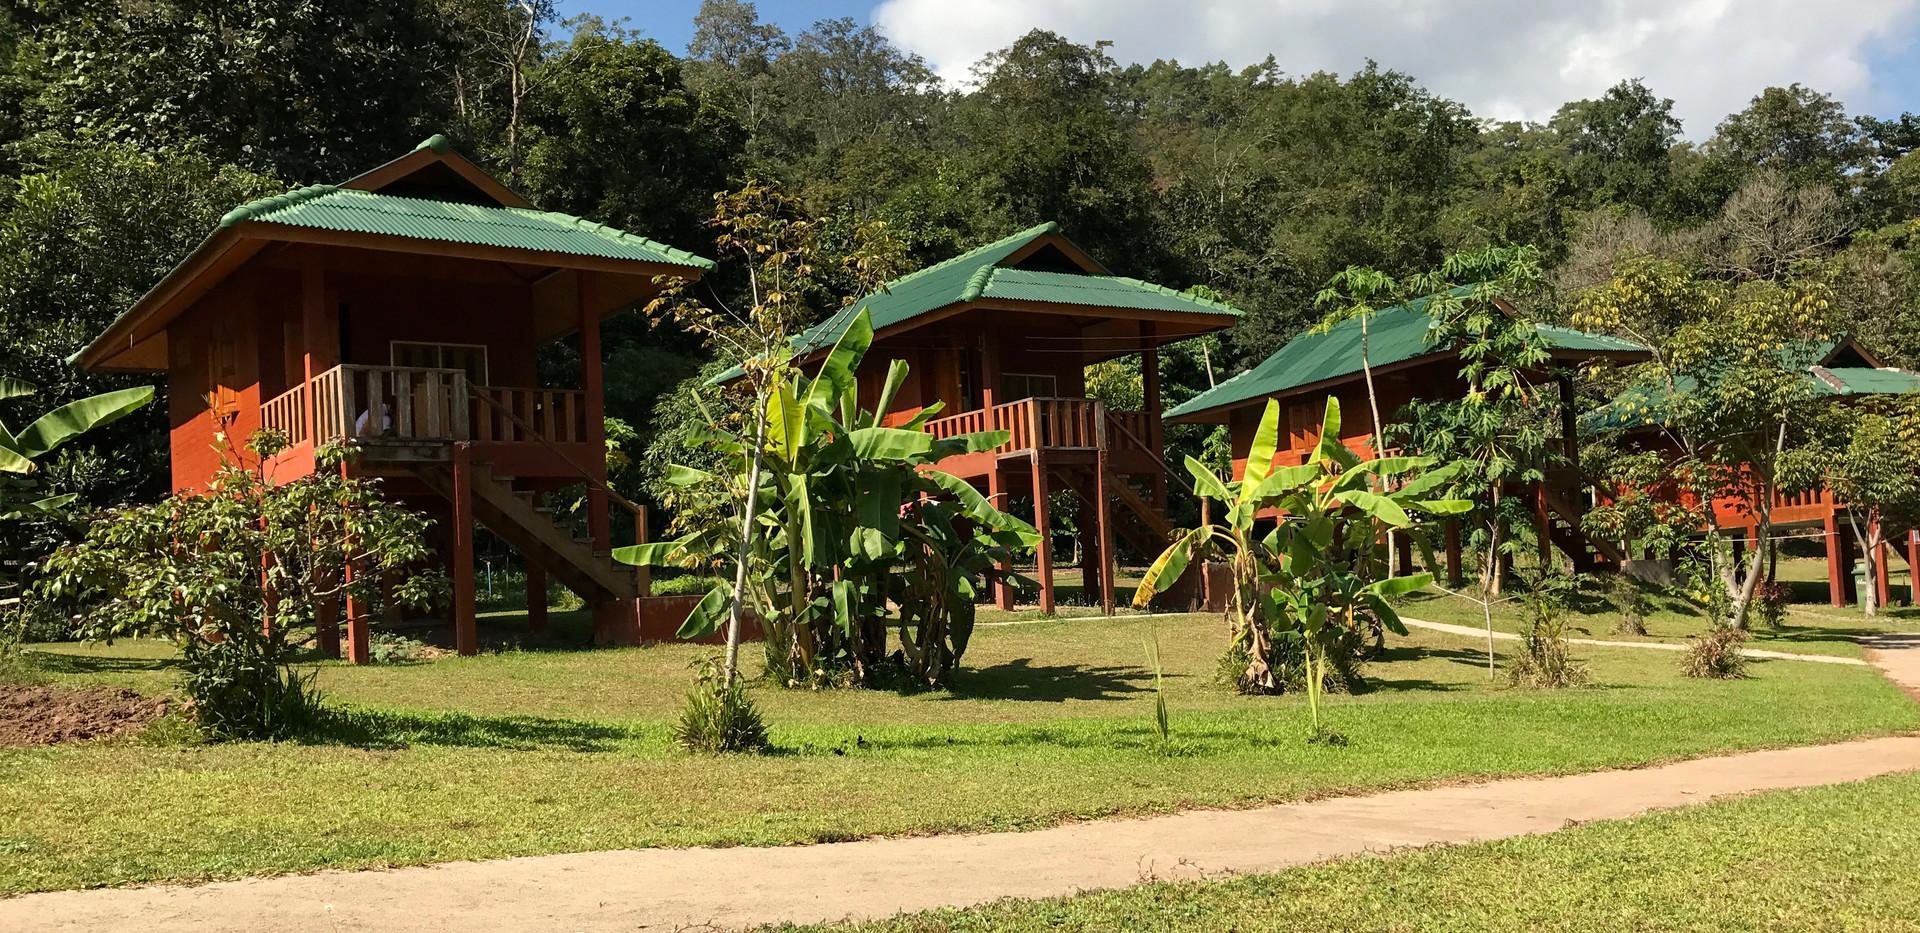 Thailand Yoga Holidays Destination Forest Meditation Center Accomodation